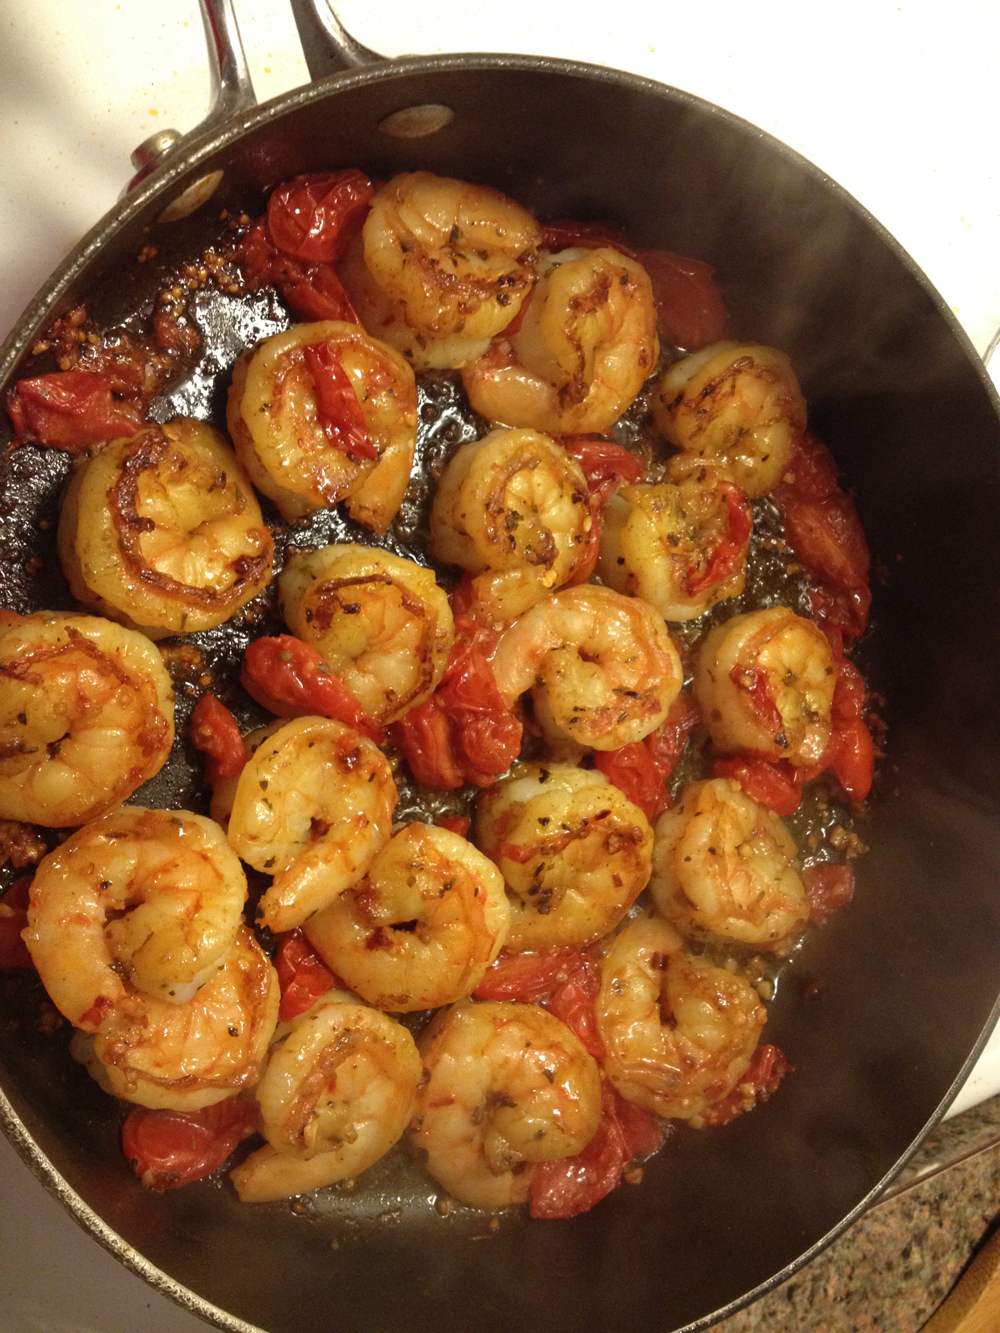 Sizzlin' shrimp.